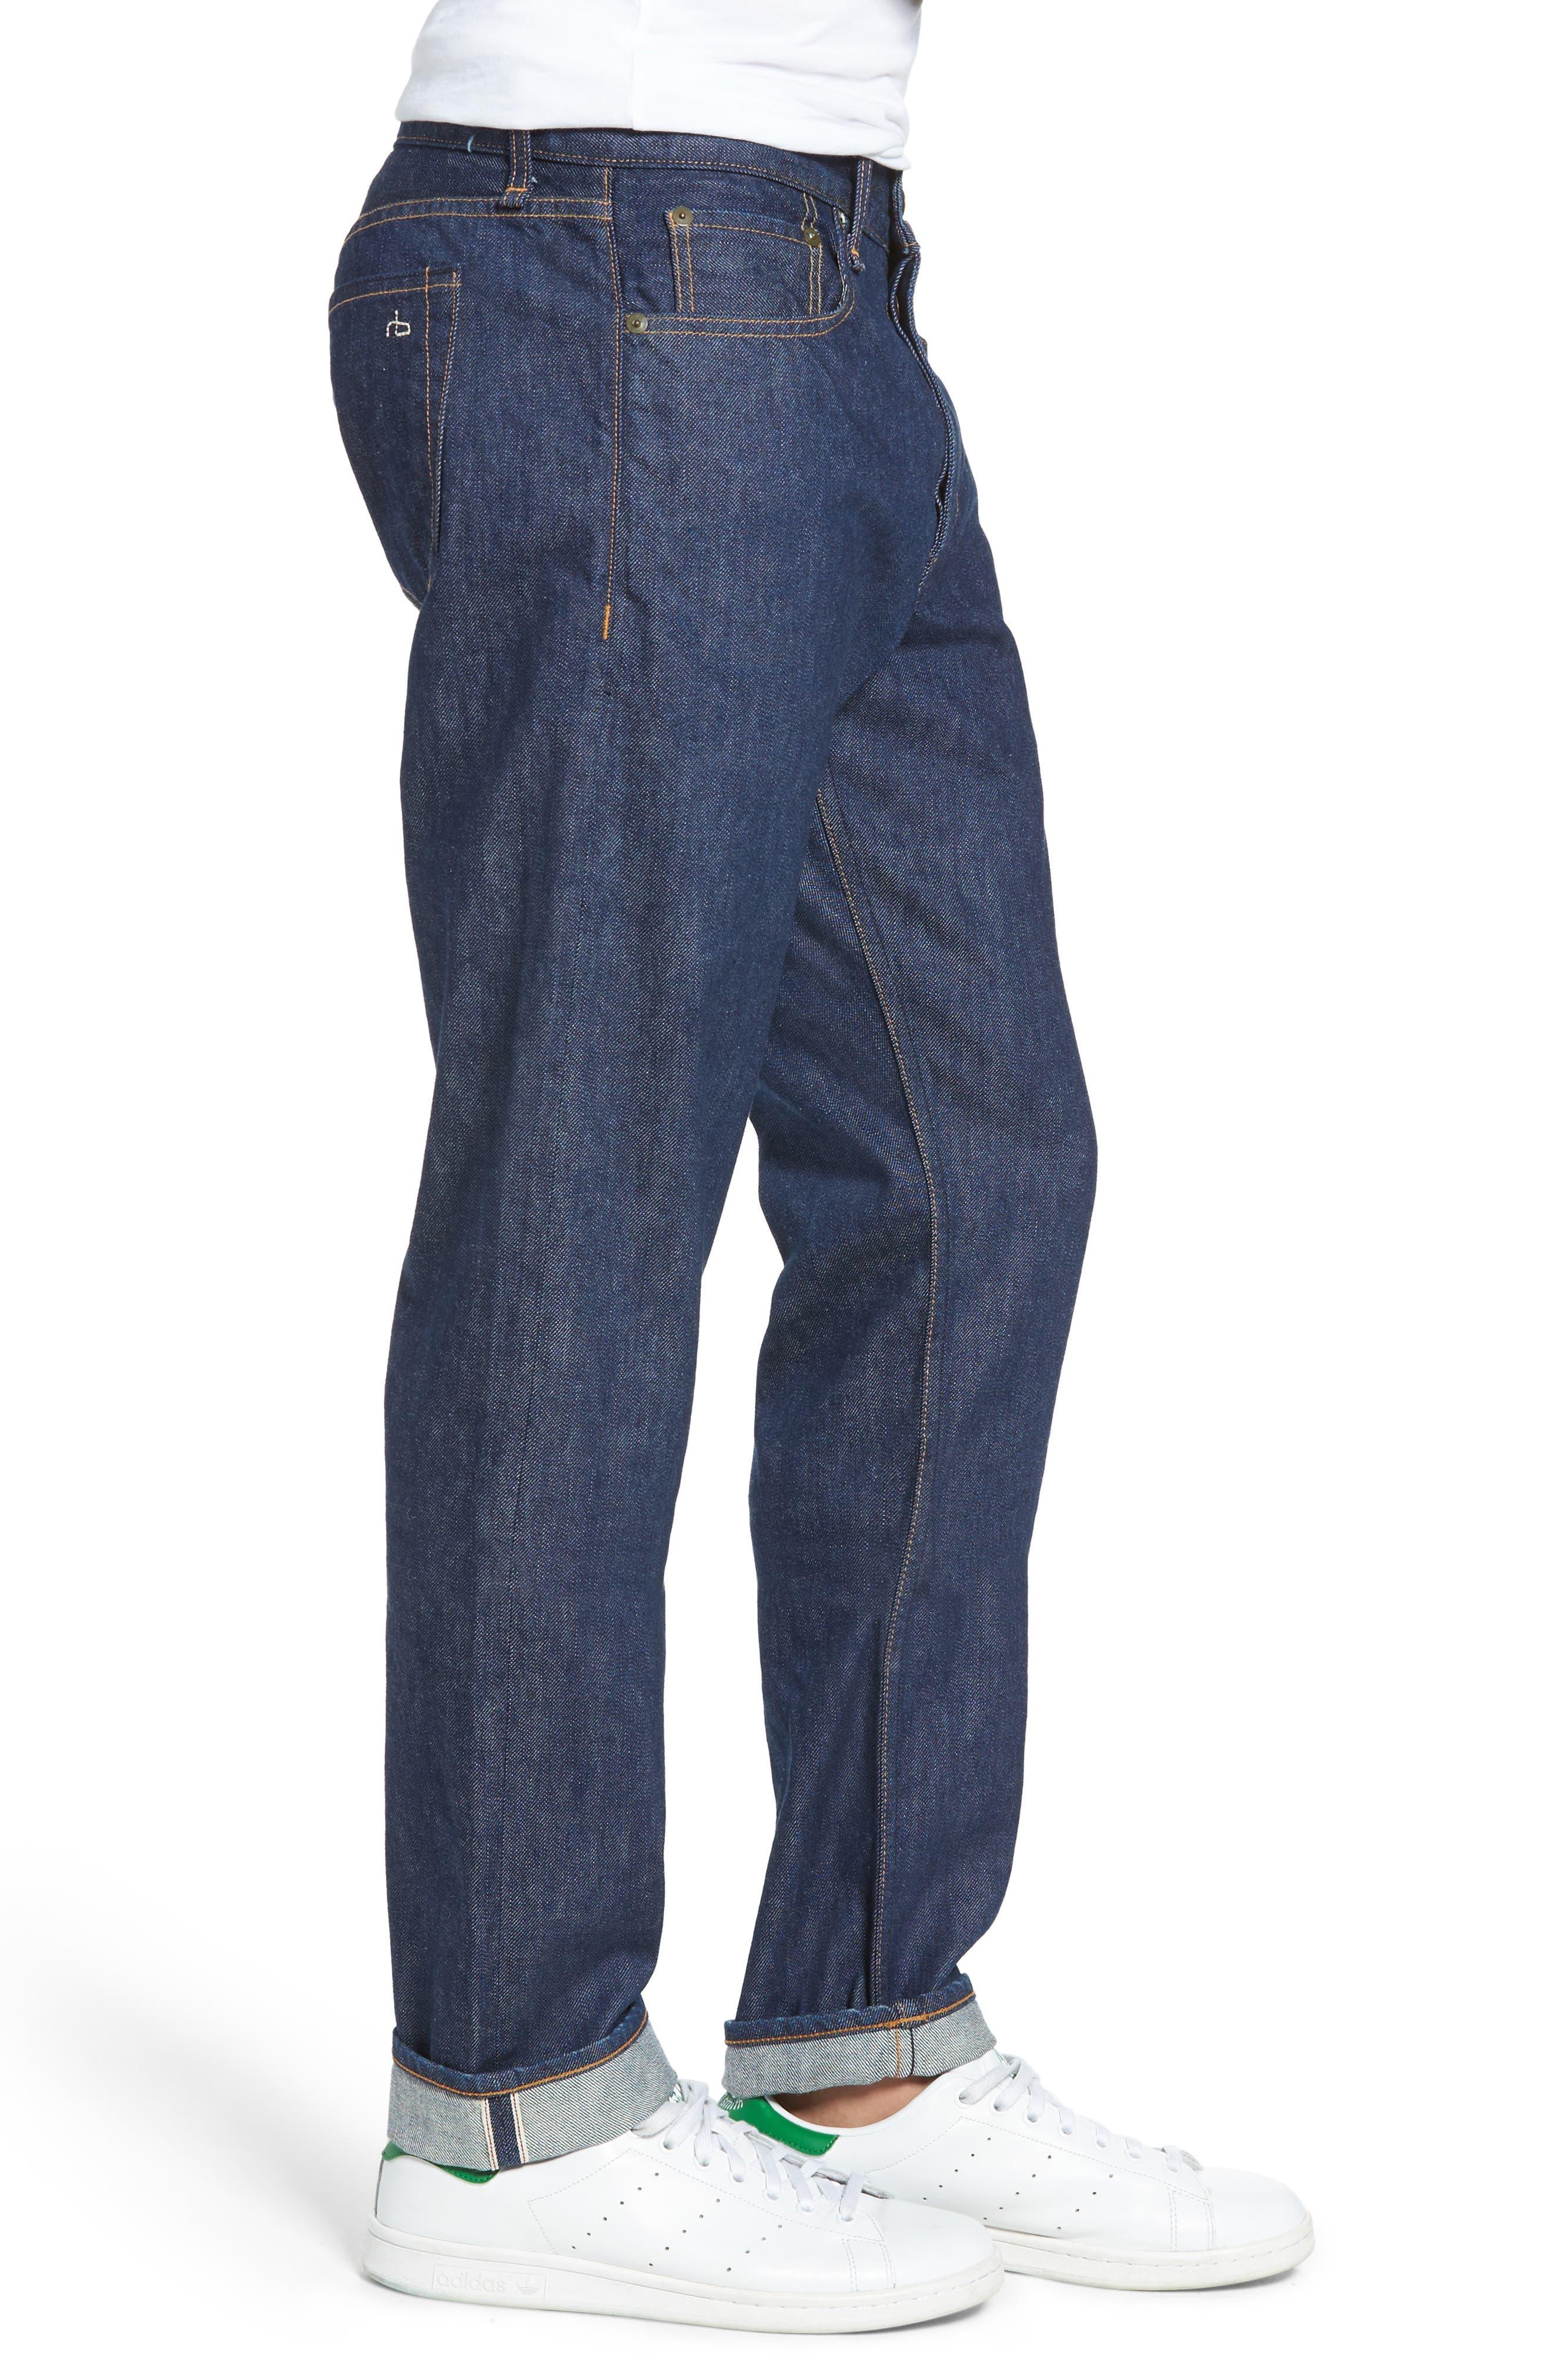 Fit 2 Slim Fit Selvedge Jeans,                             Alternate thumbnail 3, color,                             427